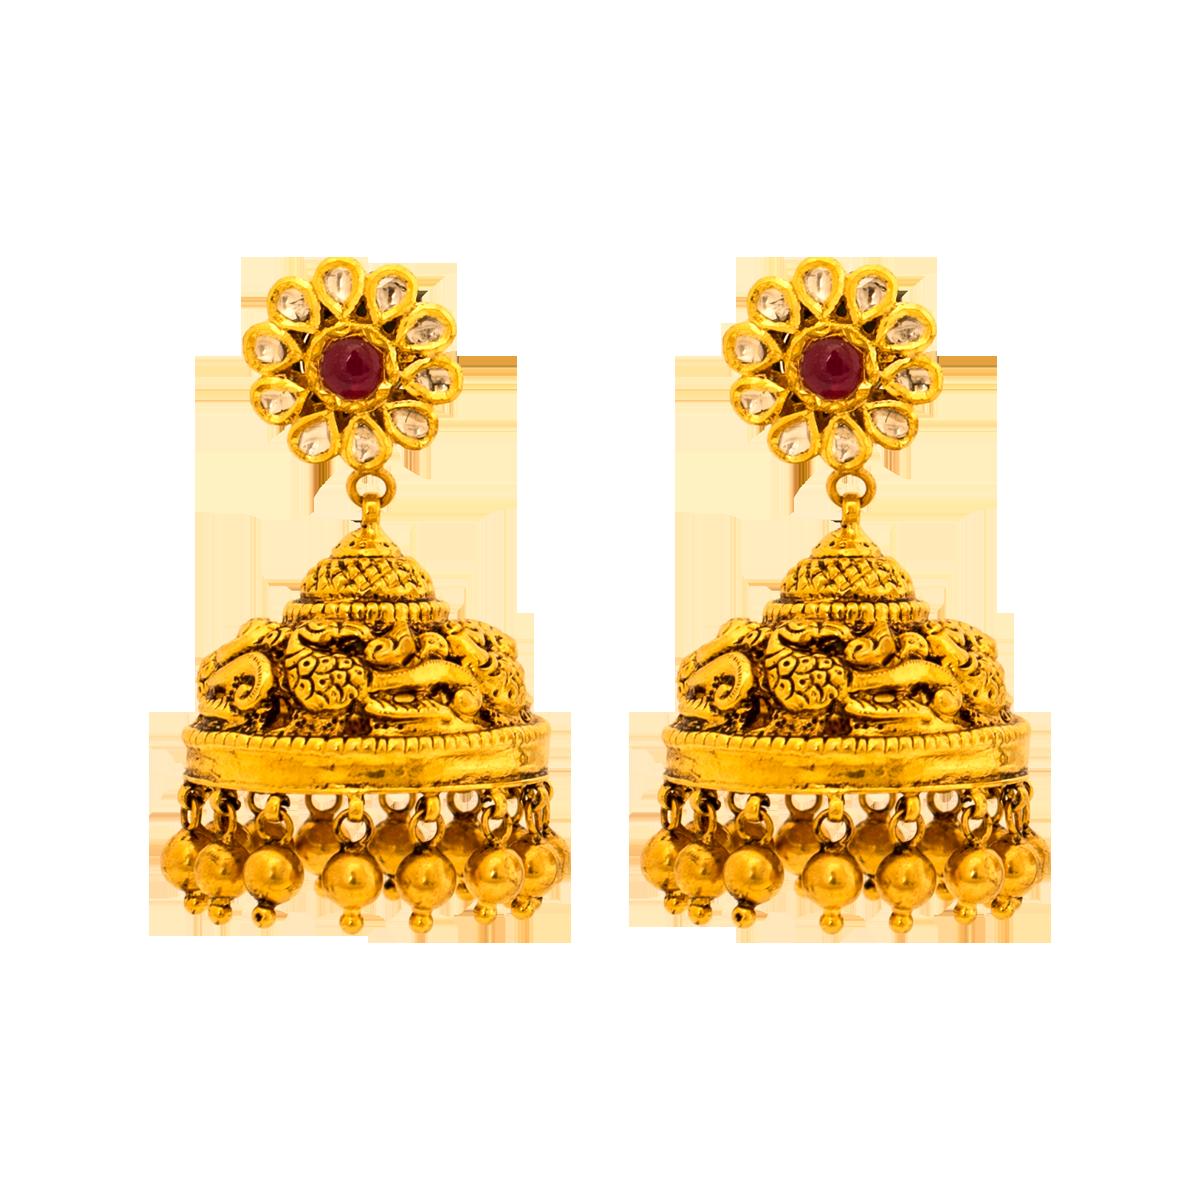 Gold Jewellery Showrooms in Panchkula